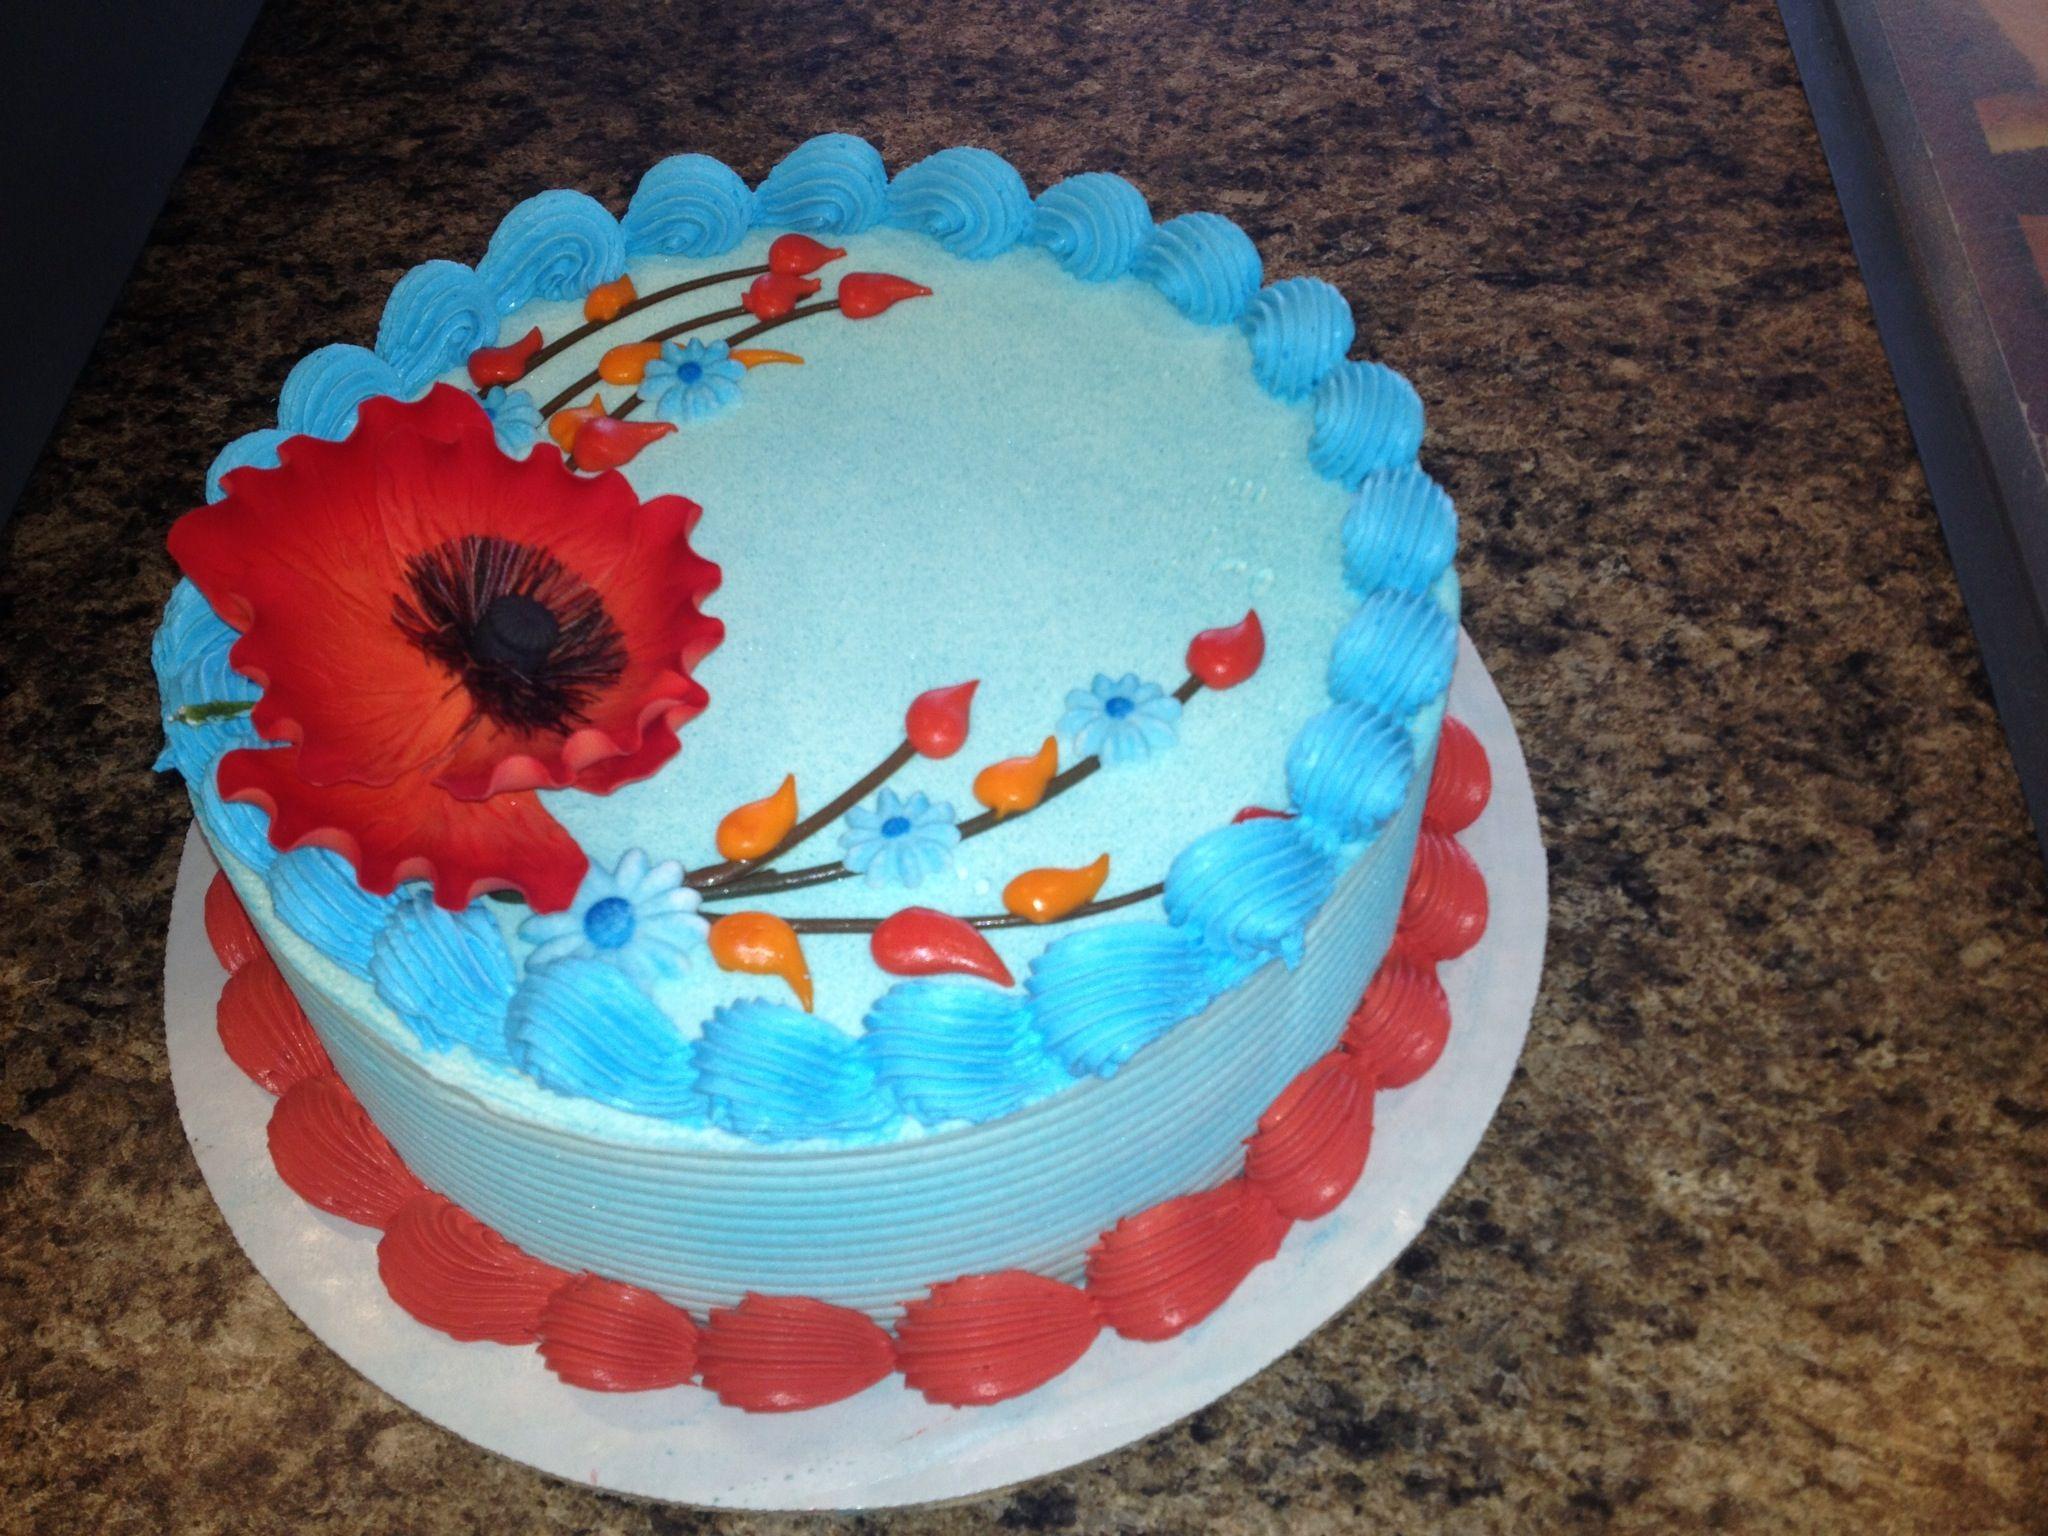 PoppyDq cakes Dairy Queen Cakes Pinterest Dairy queen